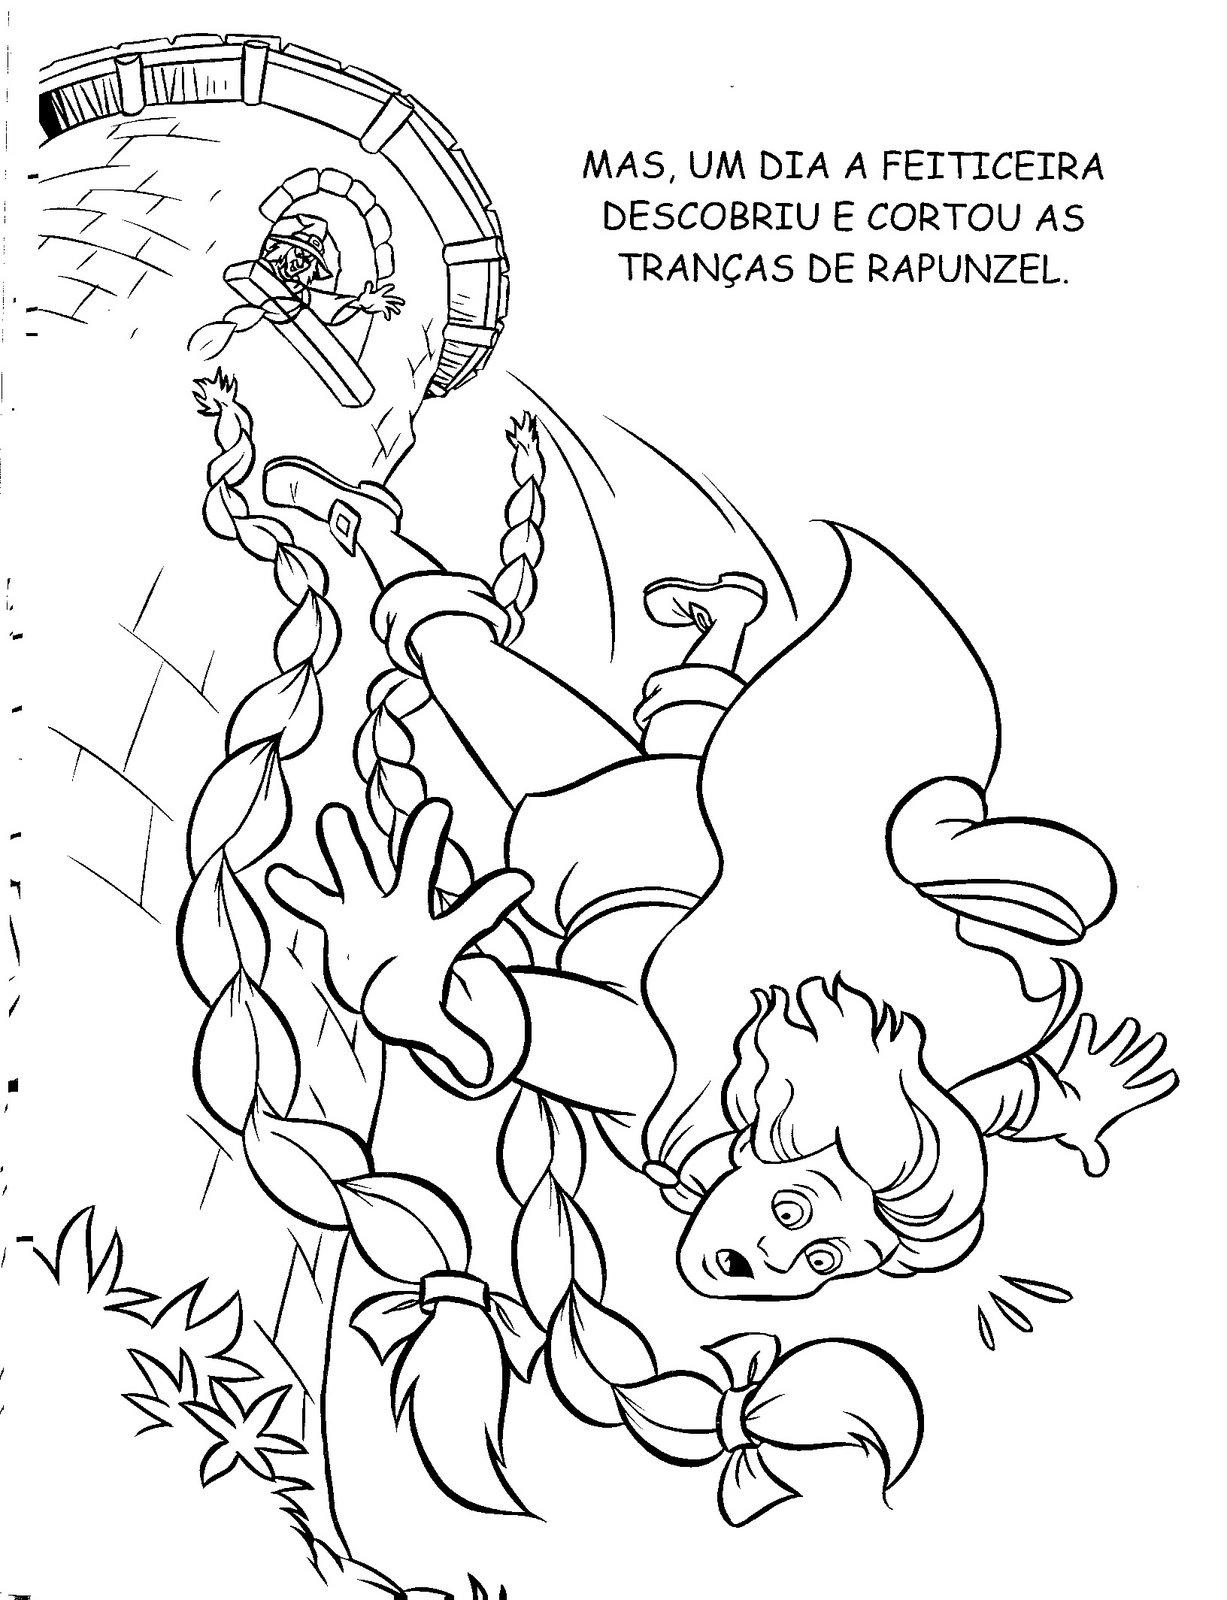 http://1.bp.blogspot.com/-3UtDEYHe-Oc/T5_izRdsVII/AAAAAAAAWiQ/i1nrCS0Gr1k/s1600/a+historia+da+rapunzel+colorir+pintar+imprimir+(14).jpg